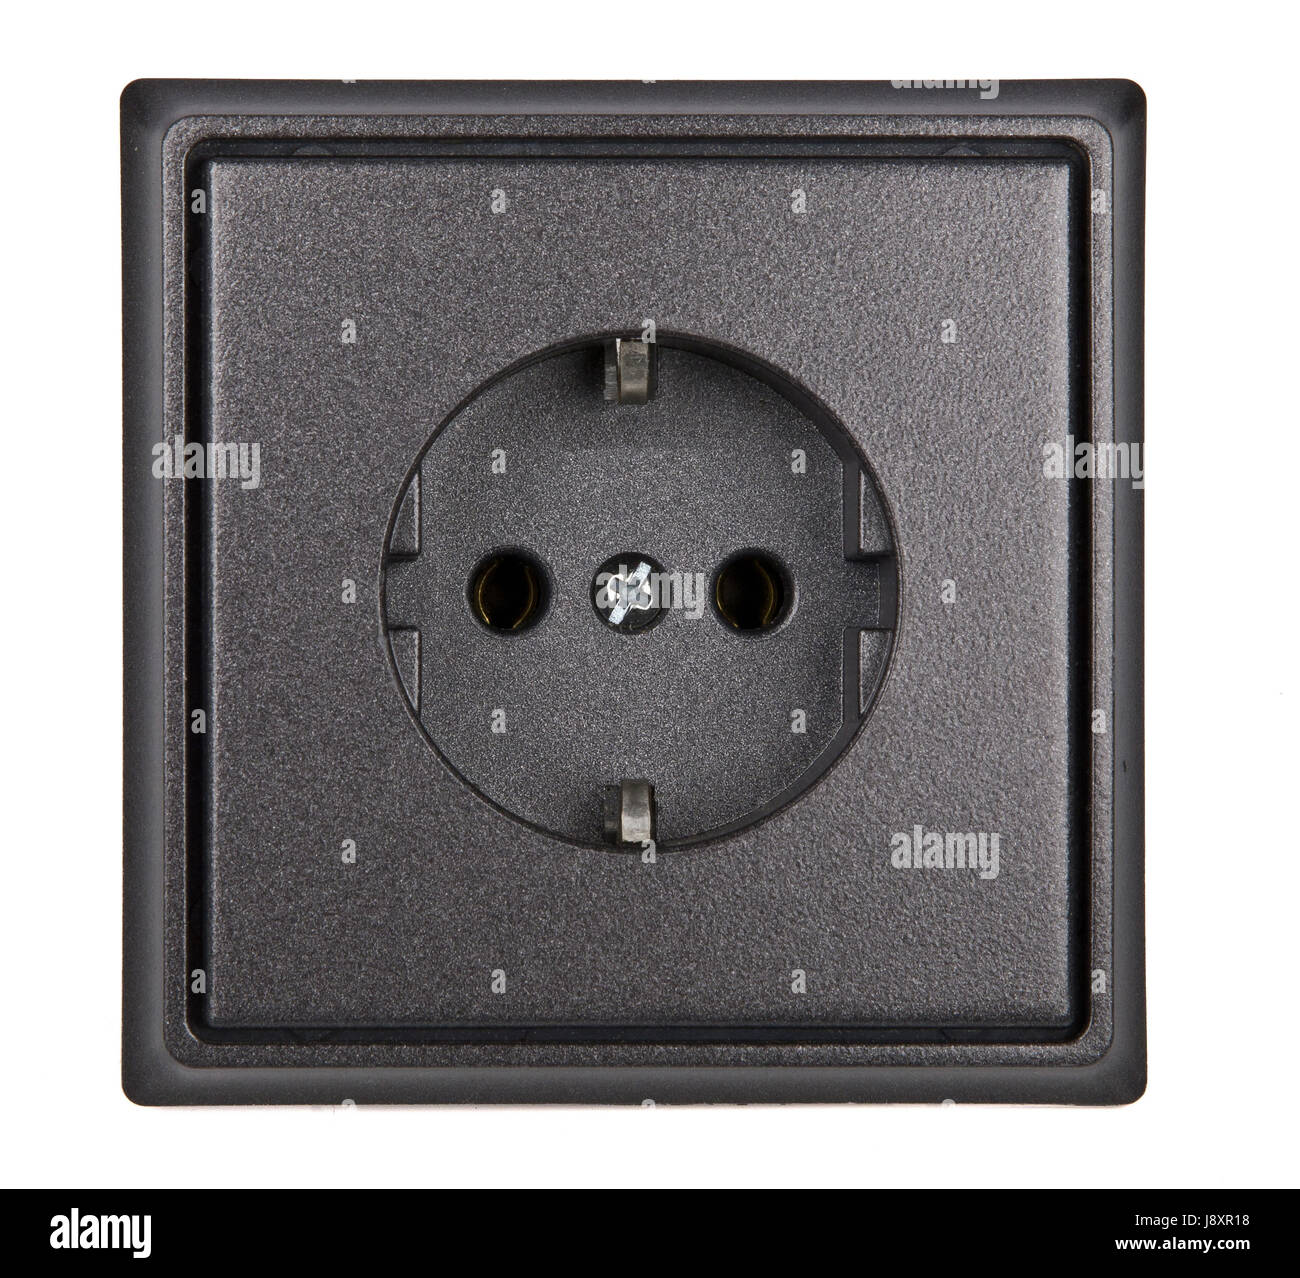 outlet, socket, voltage, technology, transfer, supply, usage, house, building, - Stock Image